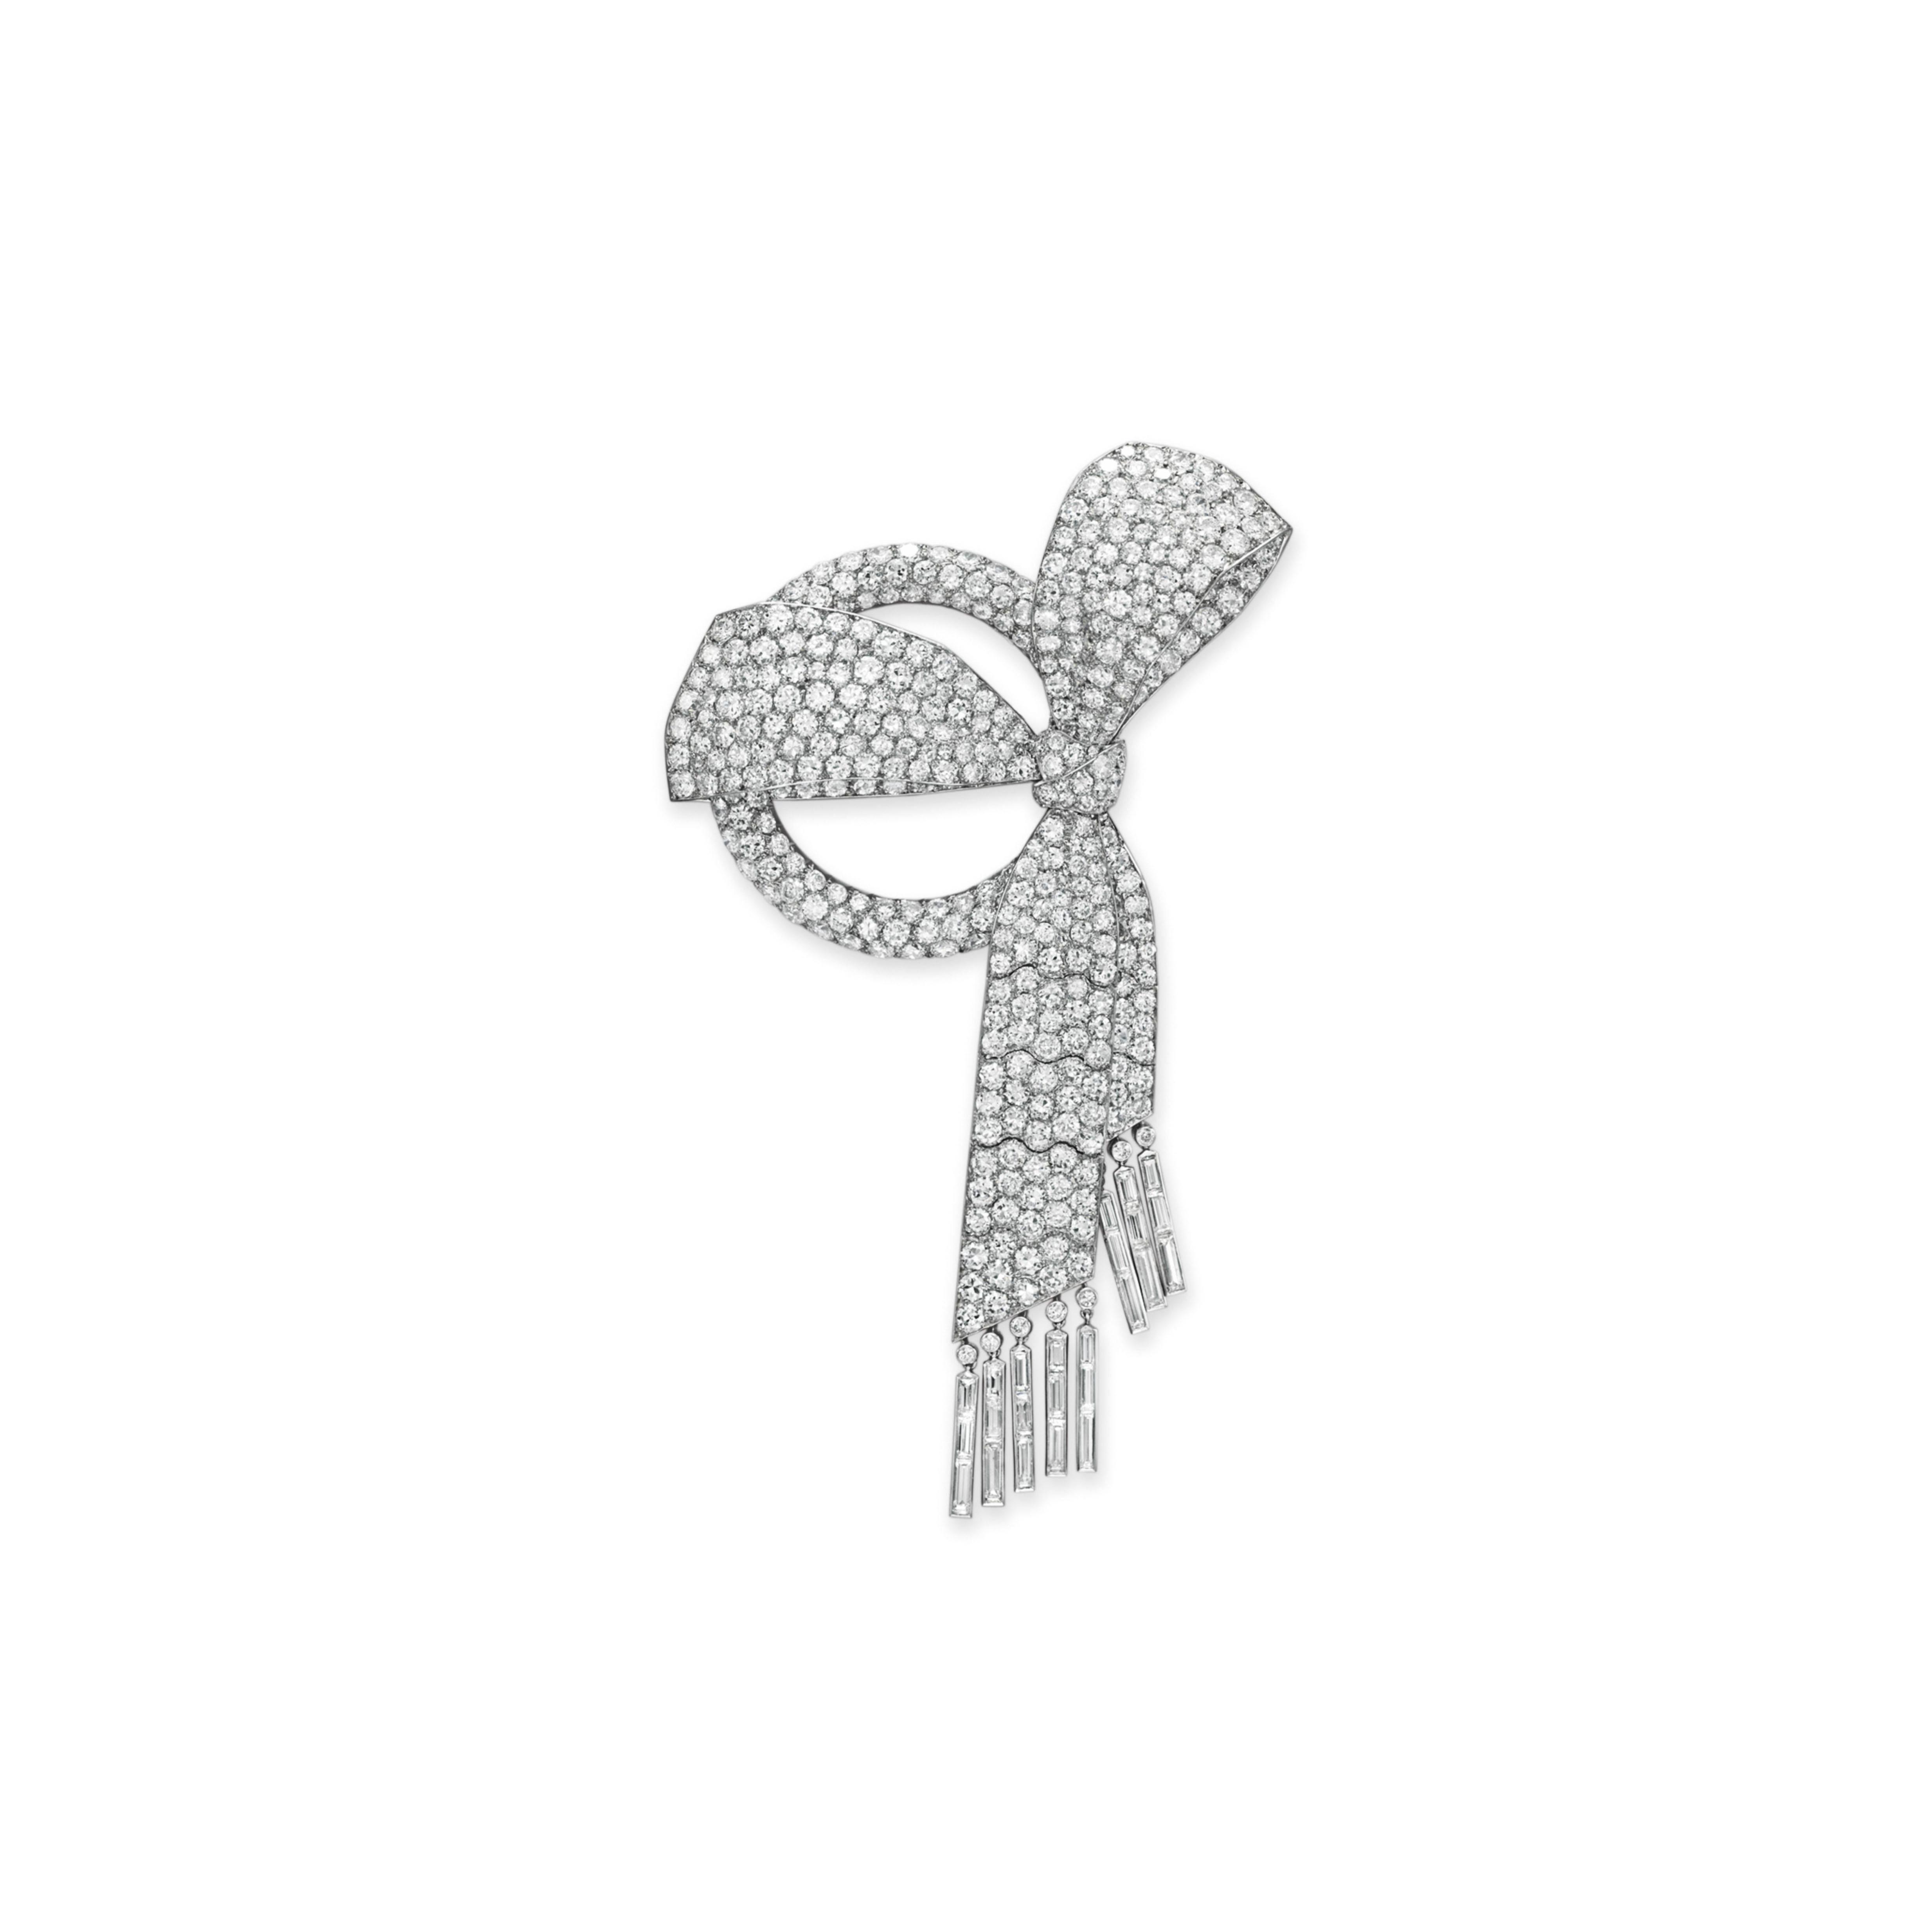 AN ART DECO DIAMOND BOW BROOCH, BY VAN CLEEF & ARPELS